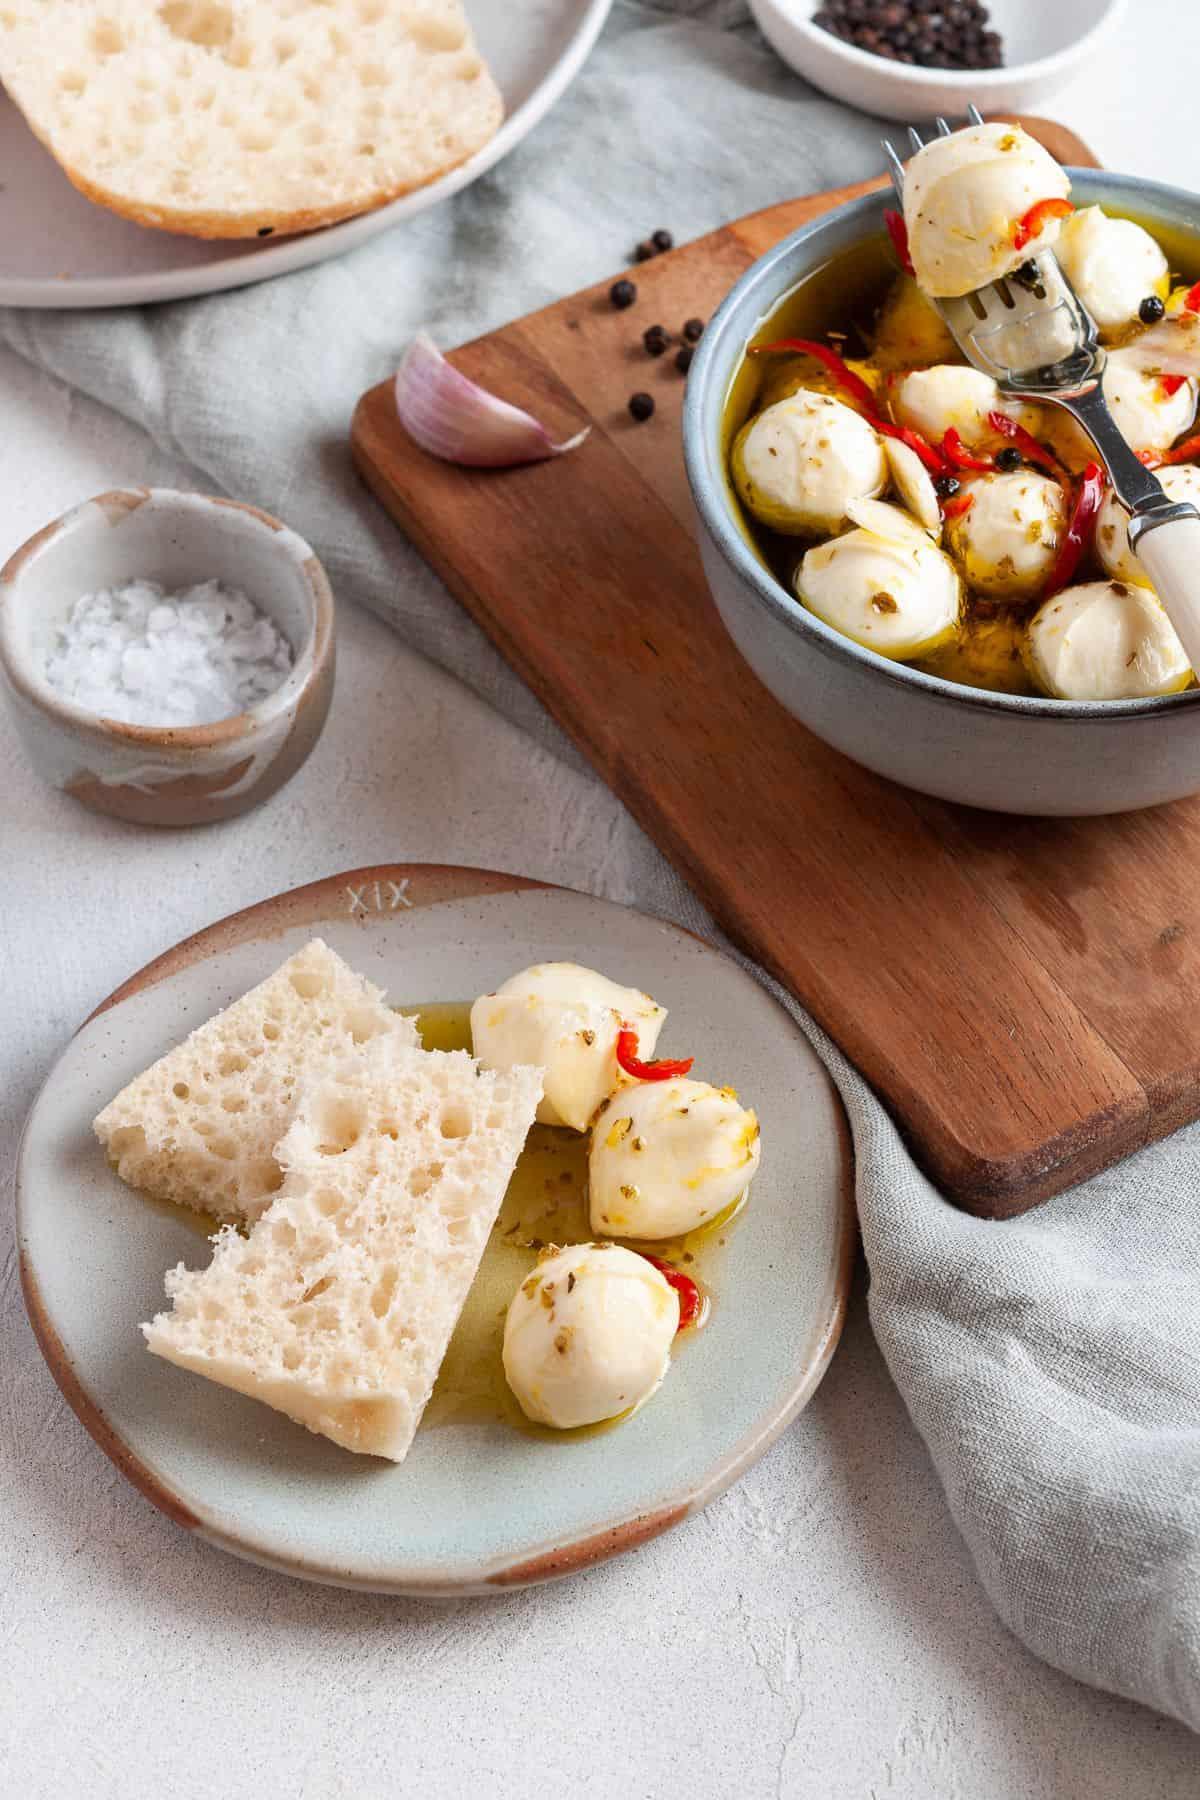 Serve of mozzarella balls on plate with some bread.